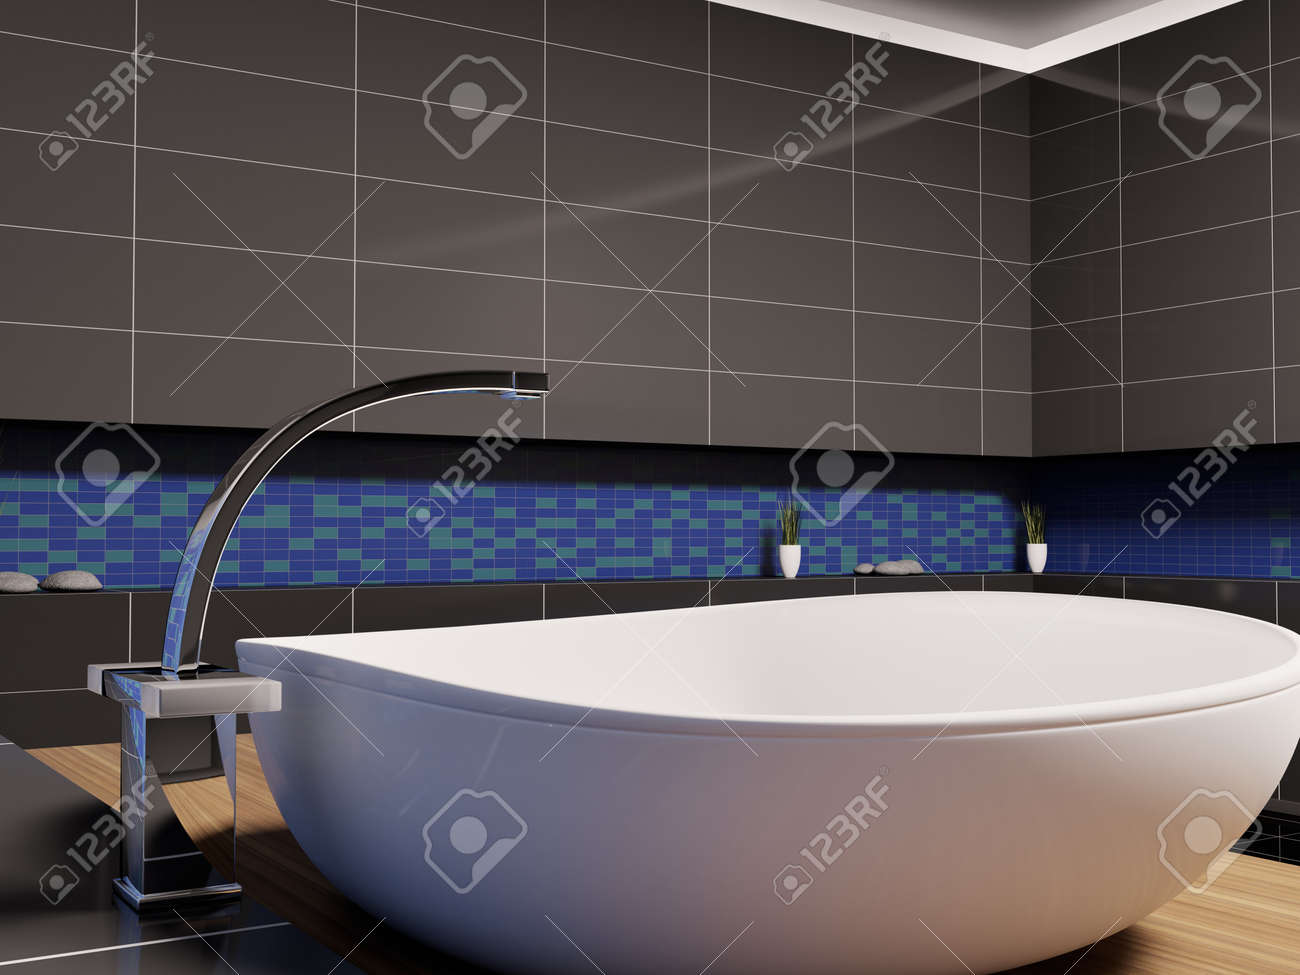 Black and blue bathroom - Stock Photo White Washbasin In Black Blue Bathroom 3d Render